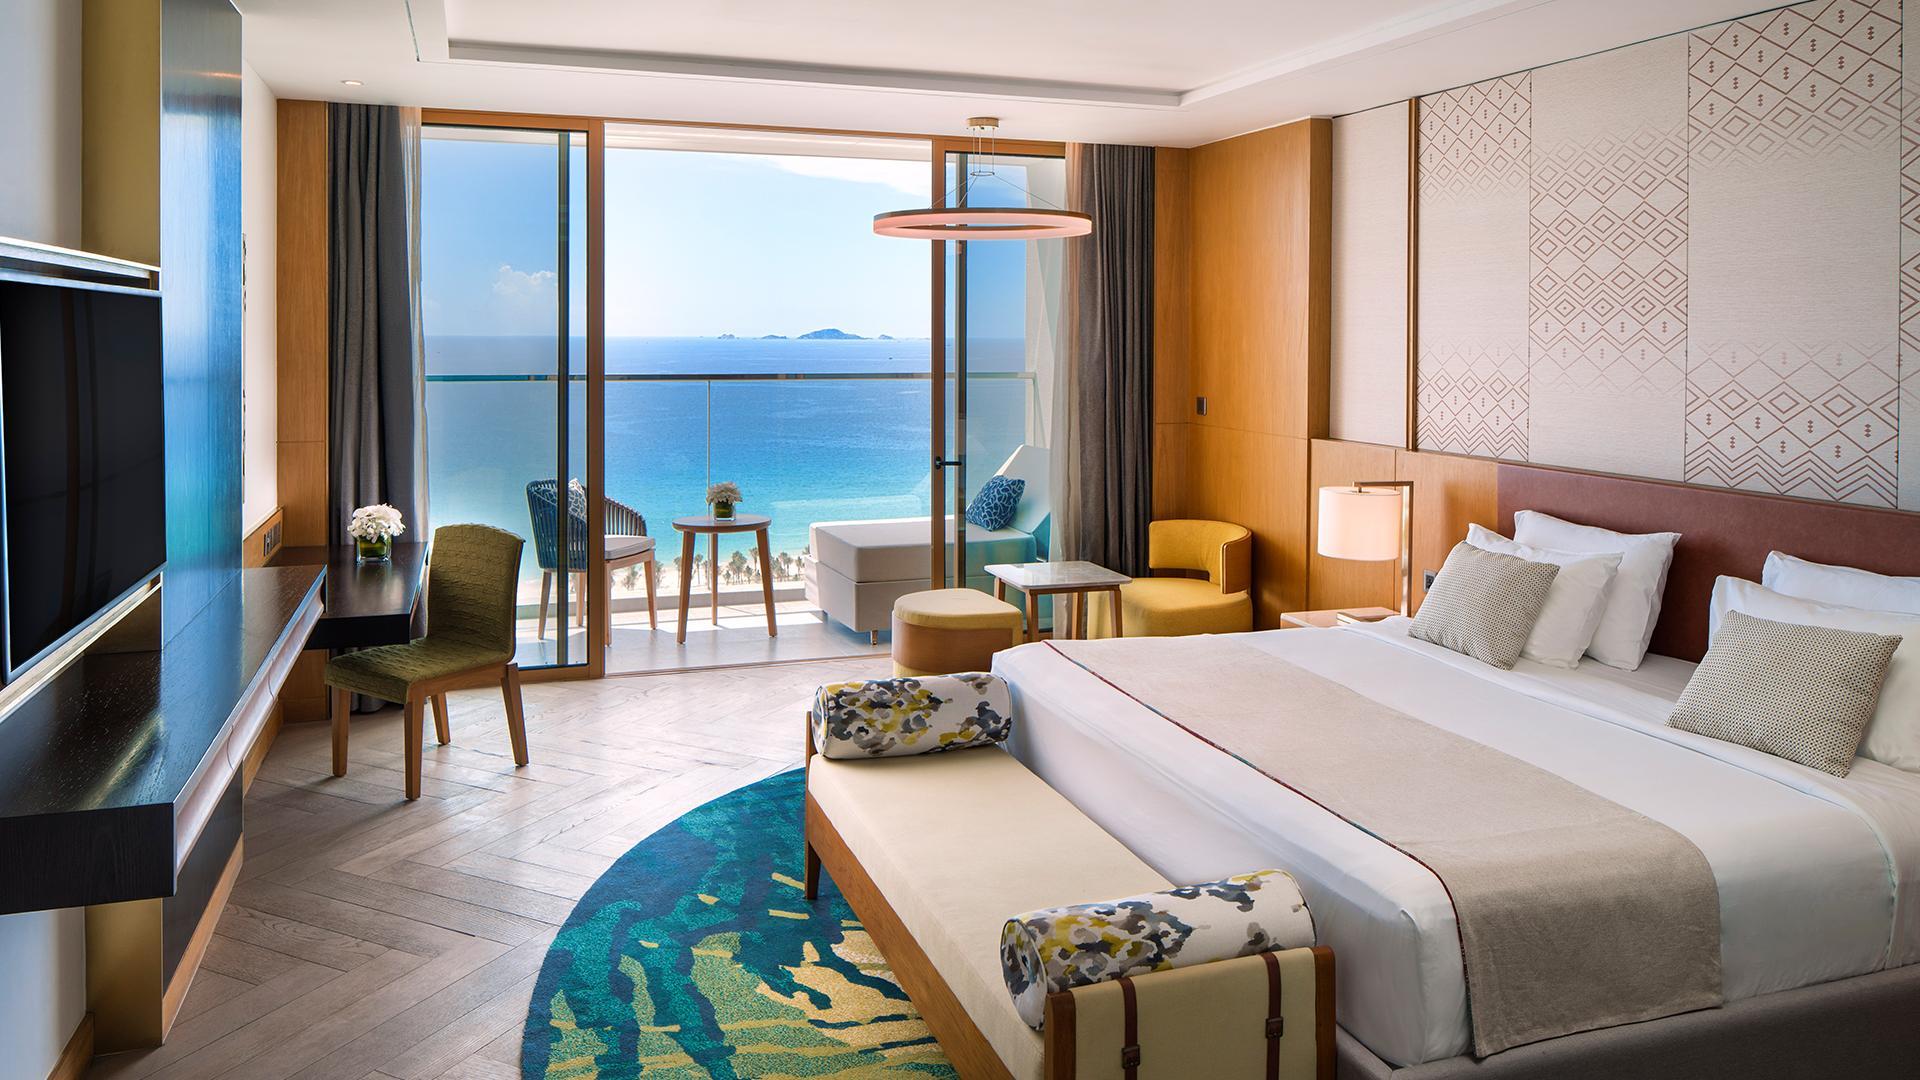 Superior Seaview Room image 1 at Mövenpick Resort Cam Ranh by Cam Lâm, Khánh Hòa, Vietnam